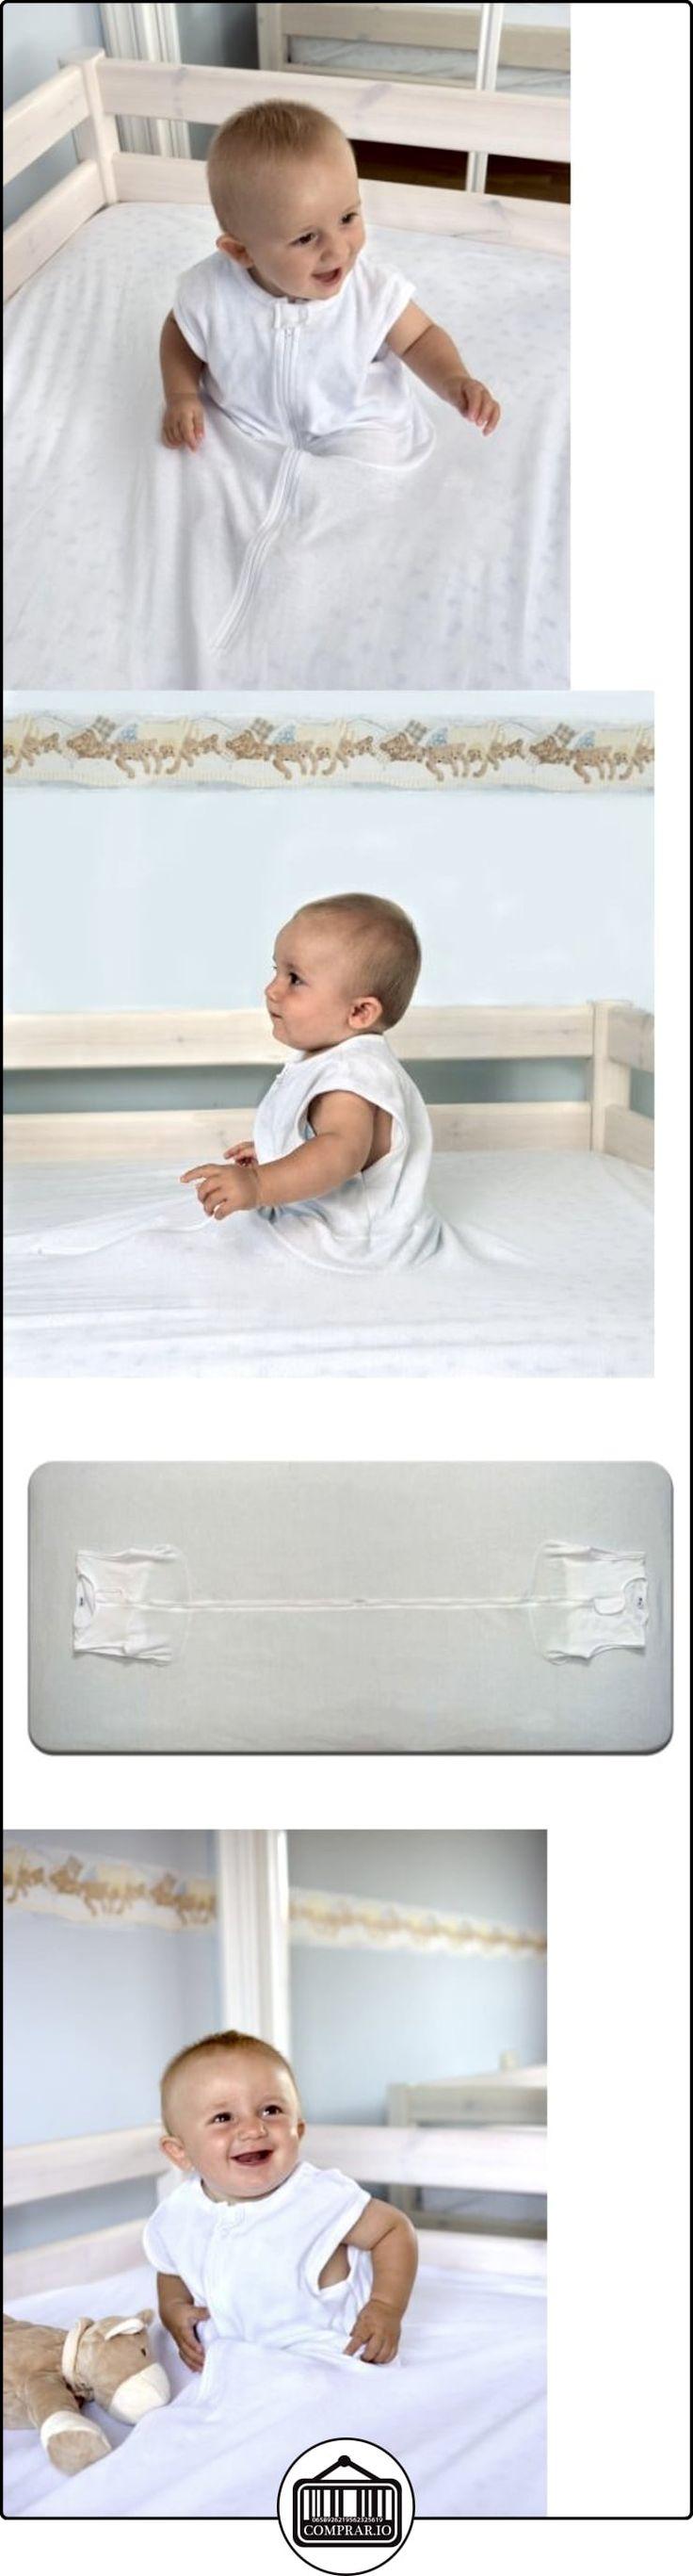 Sábana Fantasma Gemelar cama 90cm x 200cm - la sábana de seguridad original (BLANCO)  ✿ Seguridad para tu bebé - (Protege a tus hijos) ✿ ▬► Ver oferta: http://comprar.io/goto/B00BC4SD20